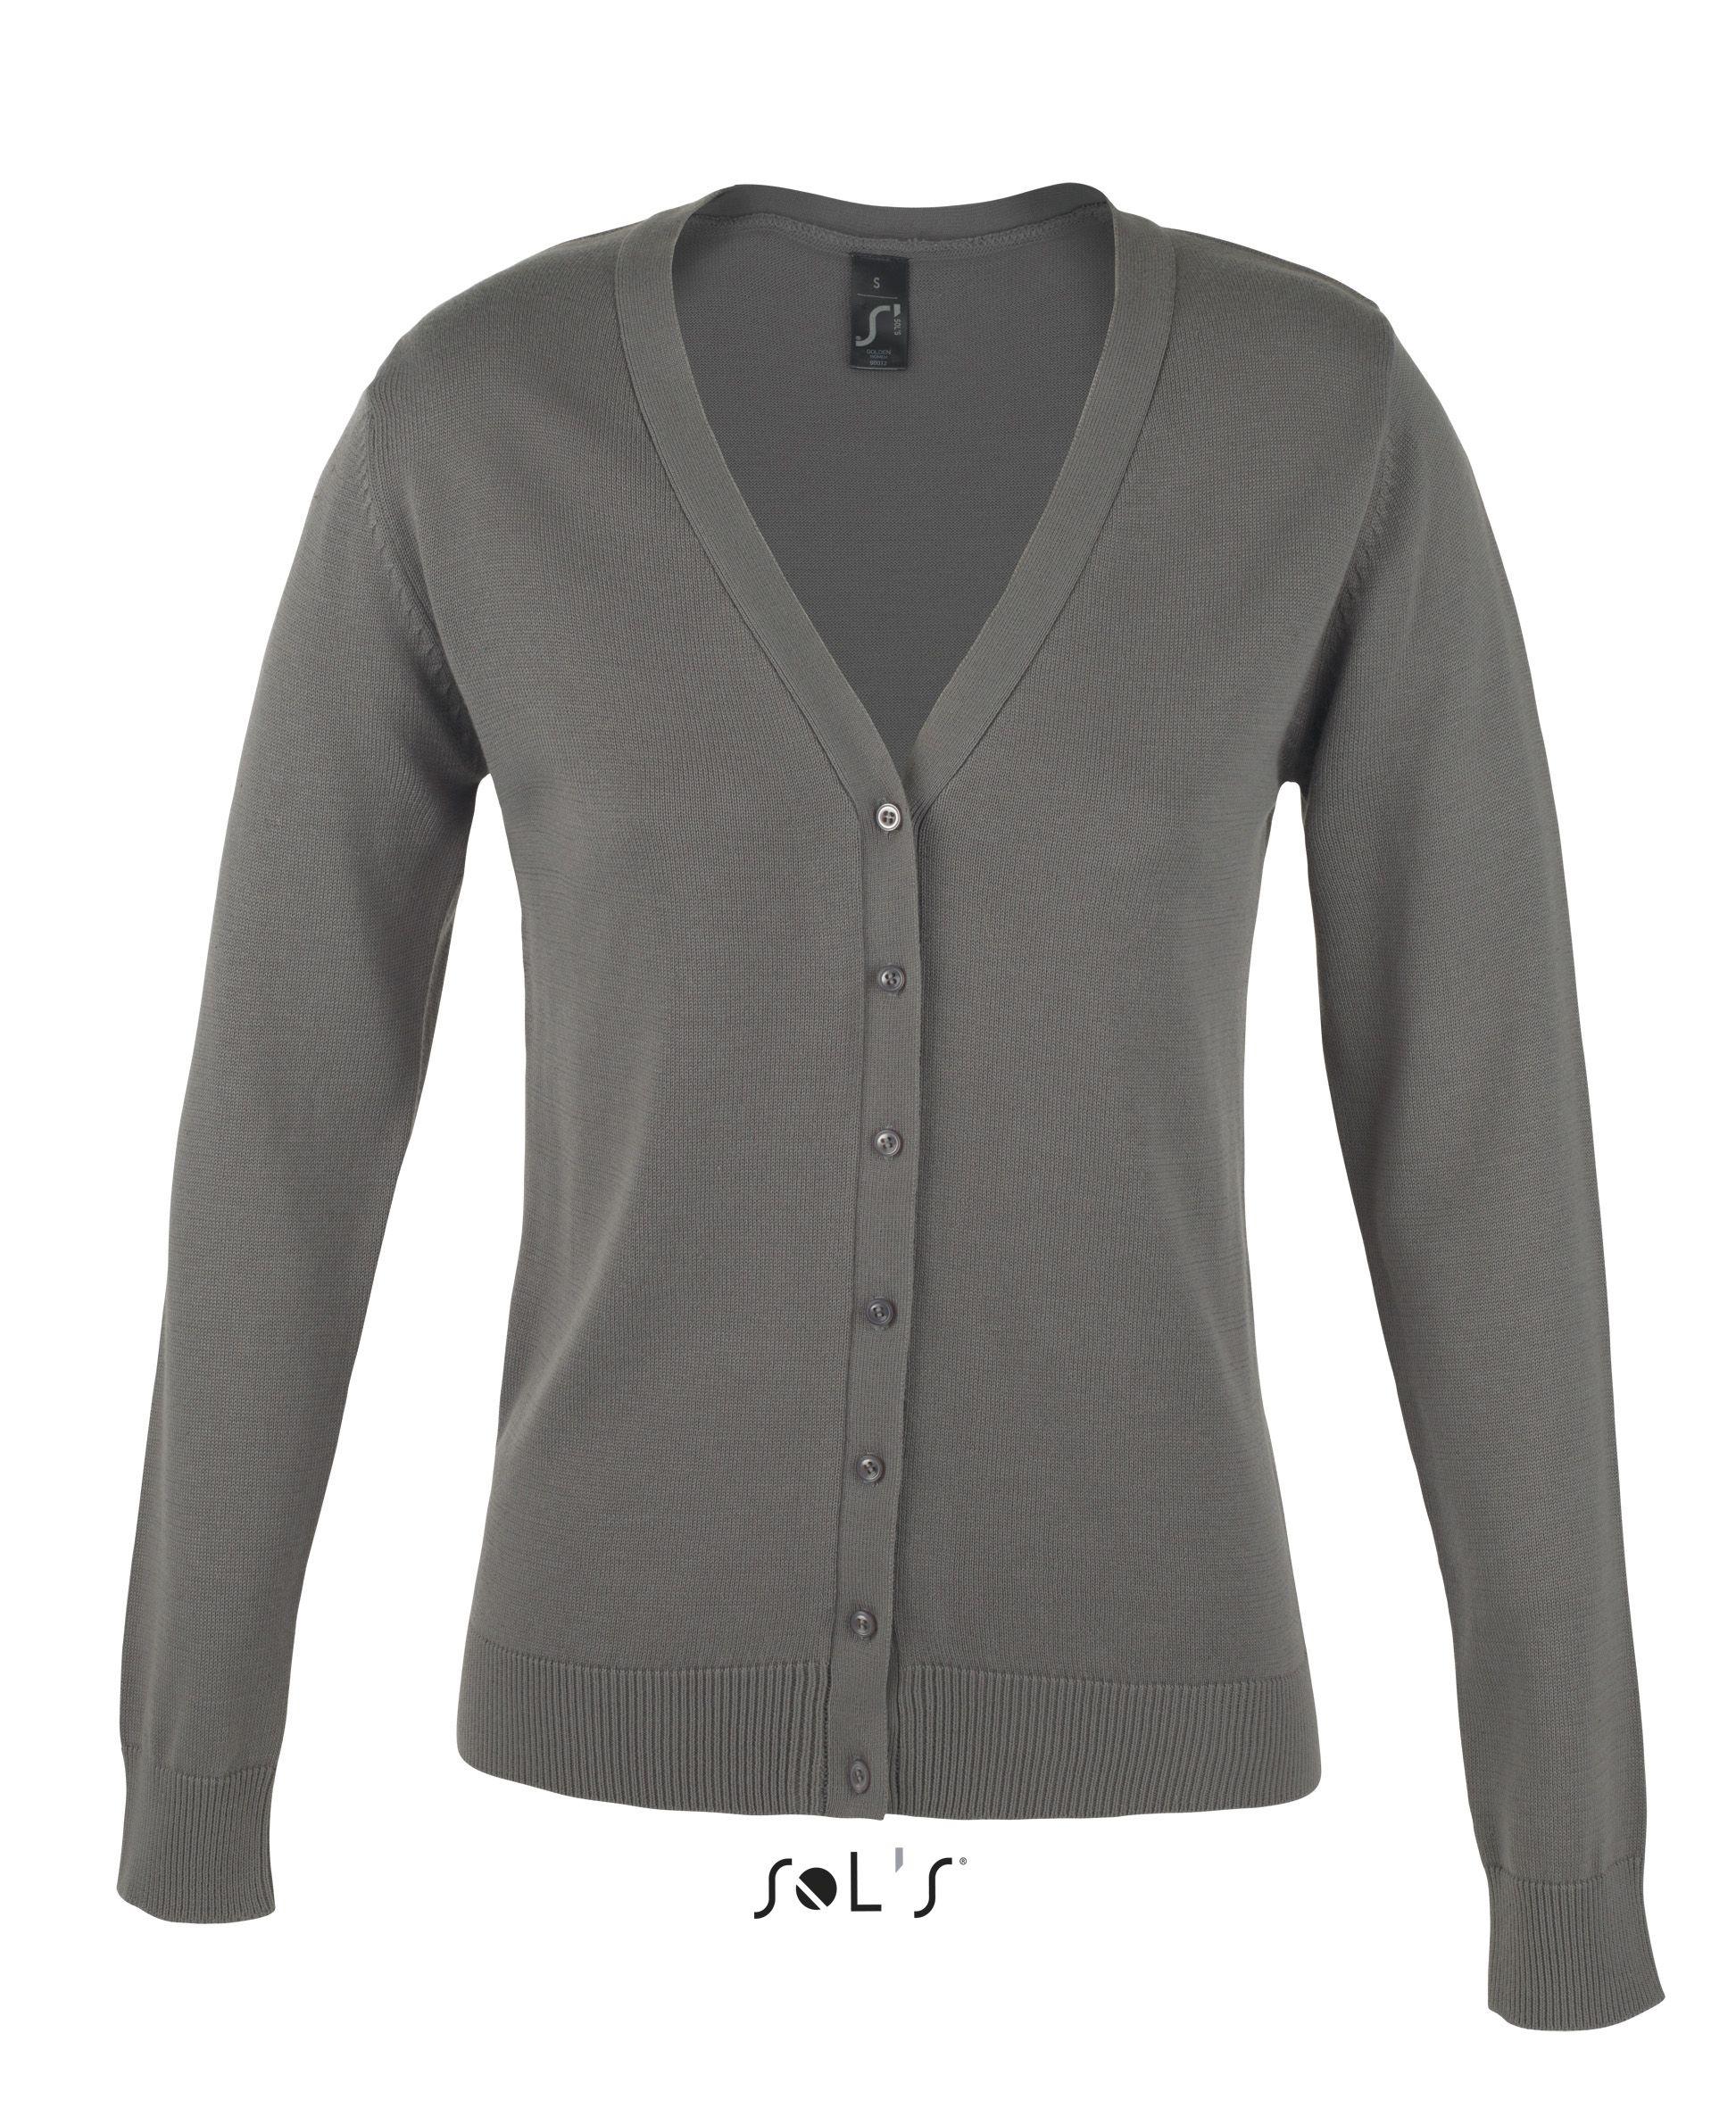 Sweter S 90012 Golden Women - 90012_medium grey_S - Kolor: Medium grey